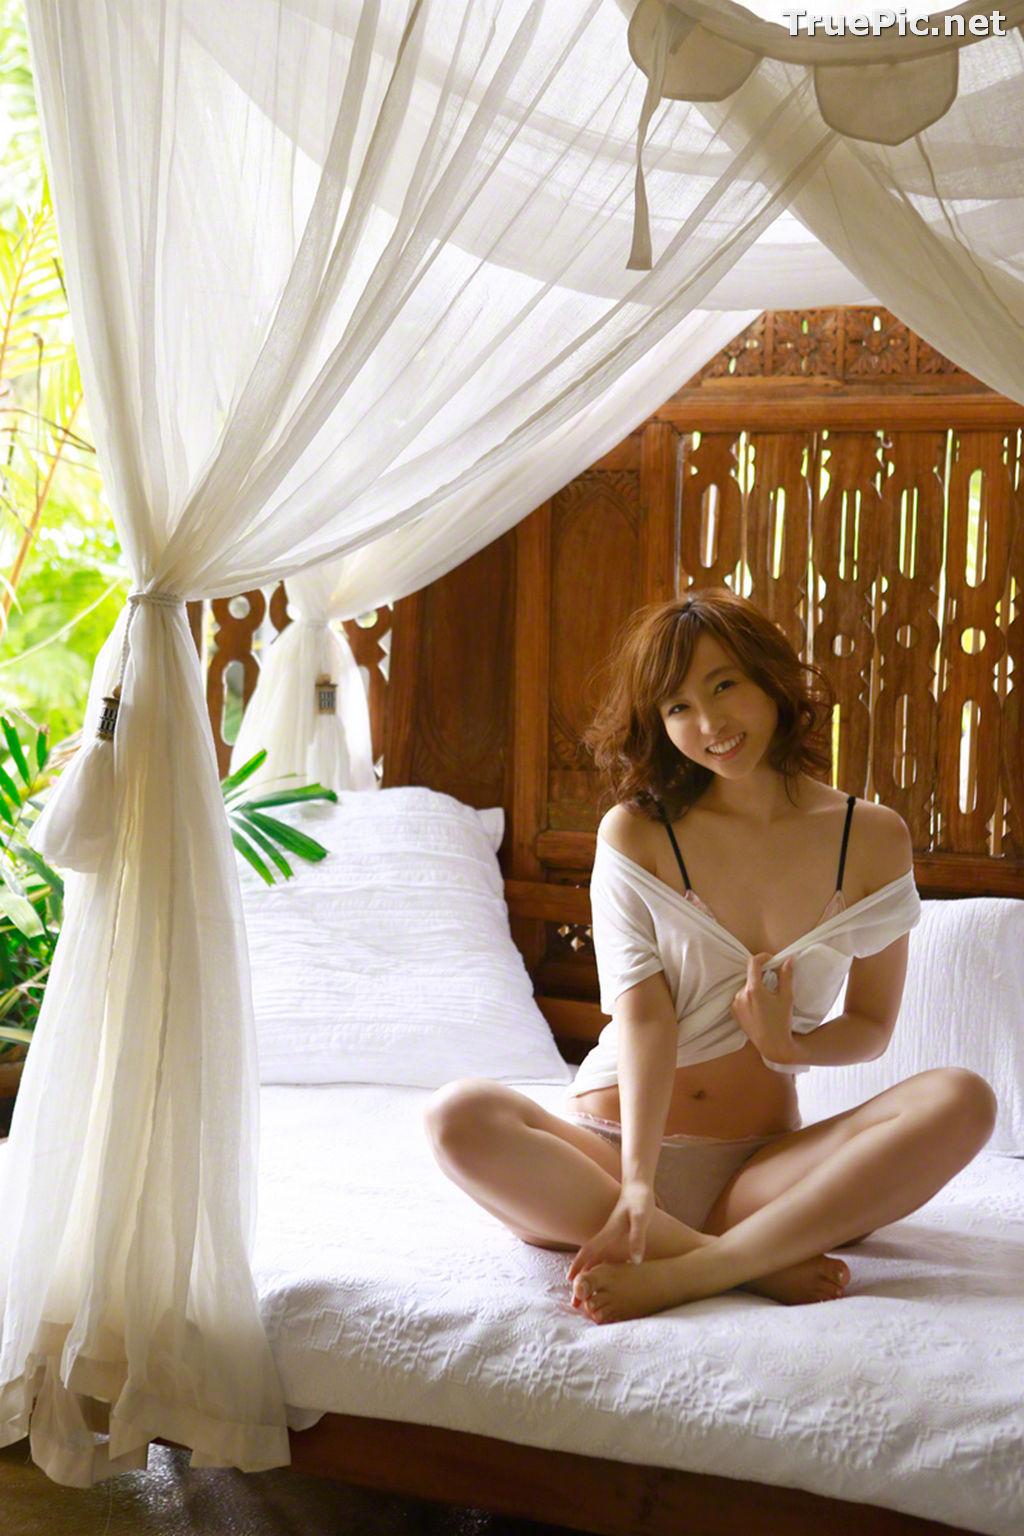 Image Wanibooks No.142 – Japanese Actress and Gravure Idol – Risa Yoshiki - TruePic.net - Picture-9